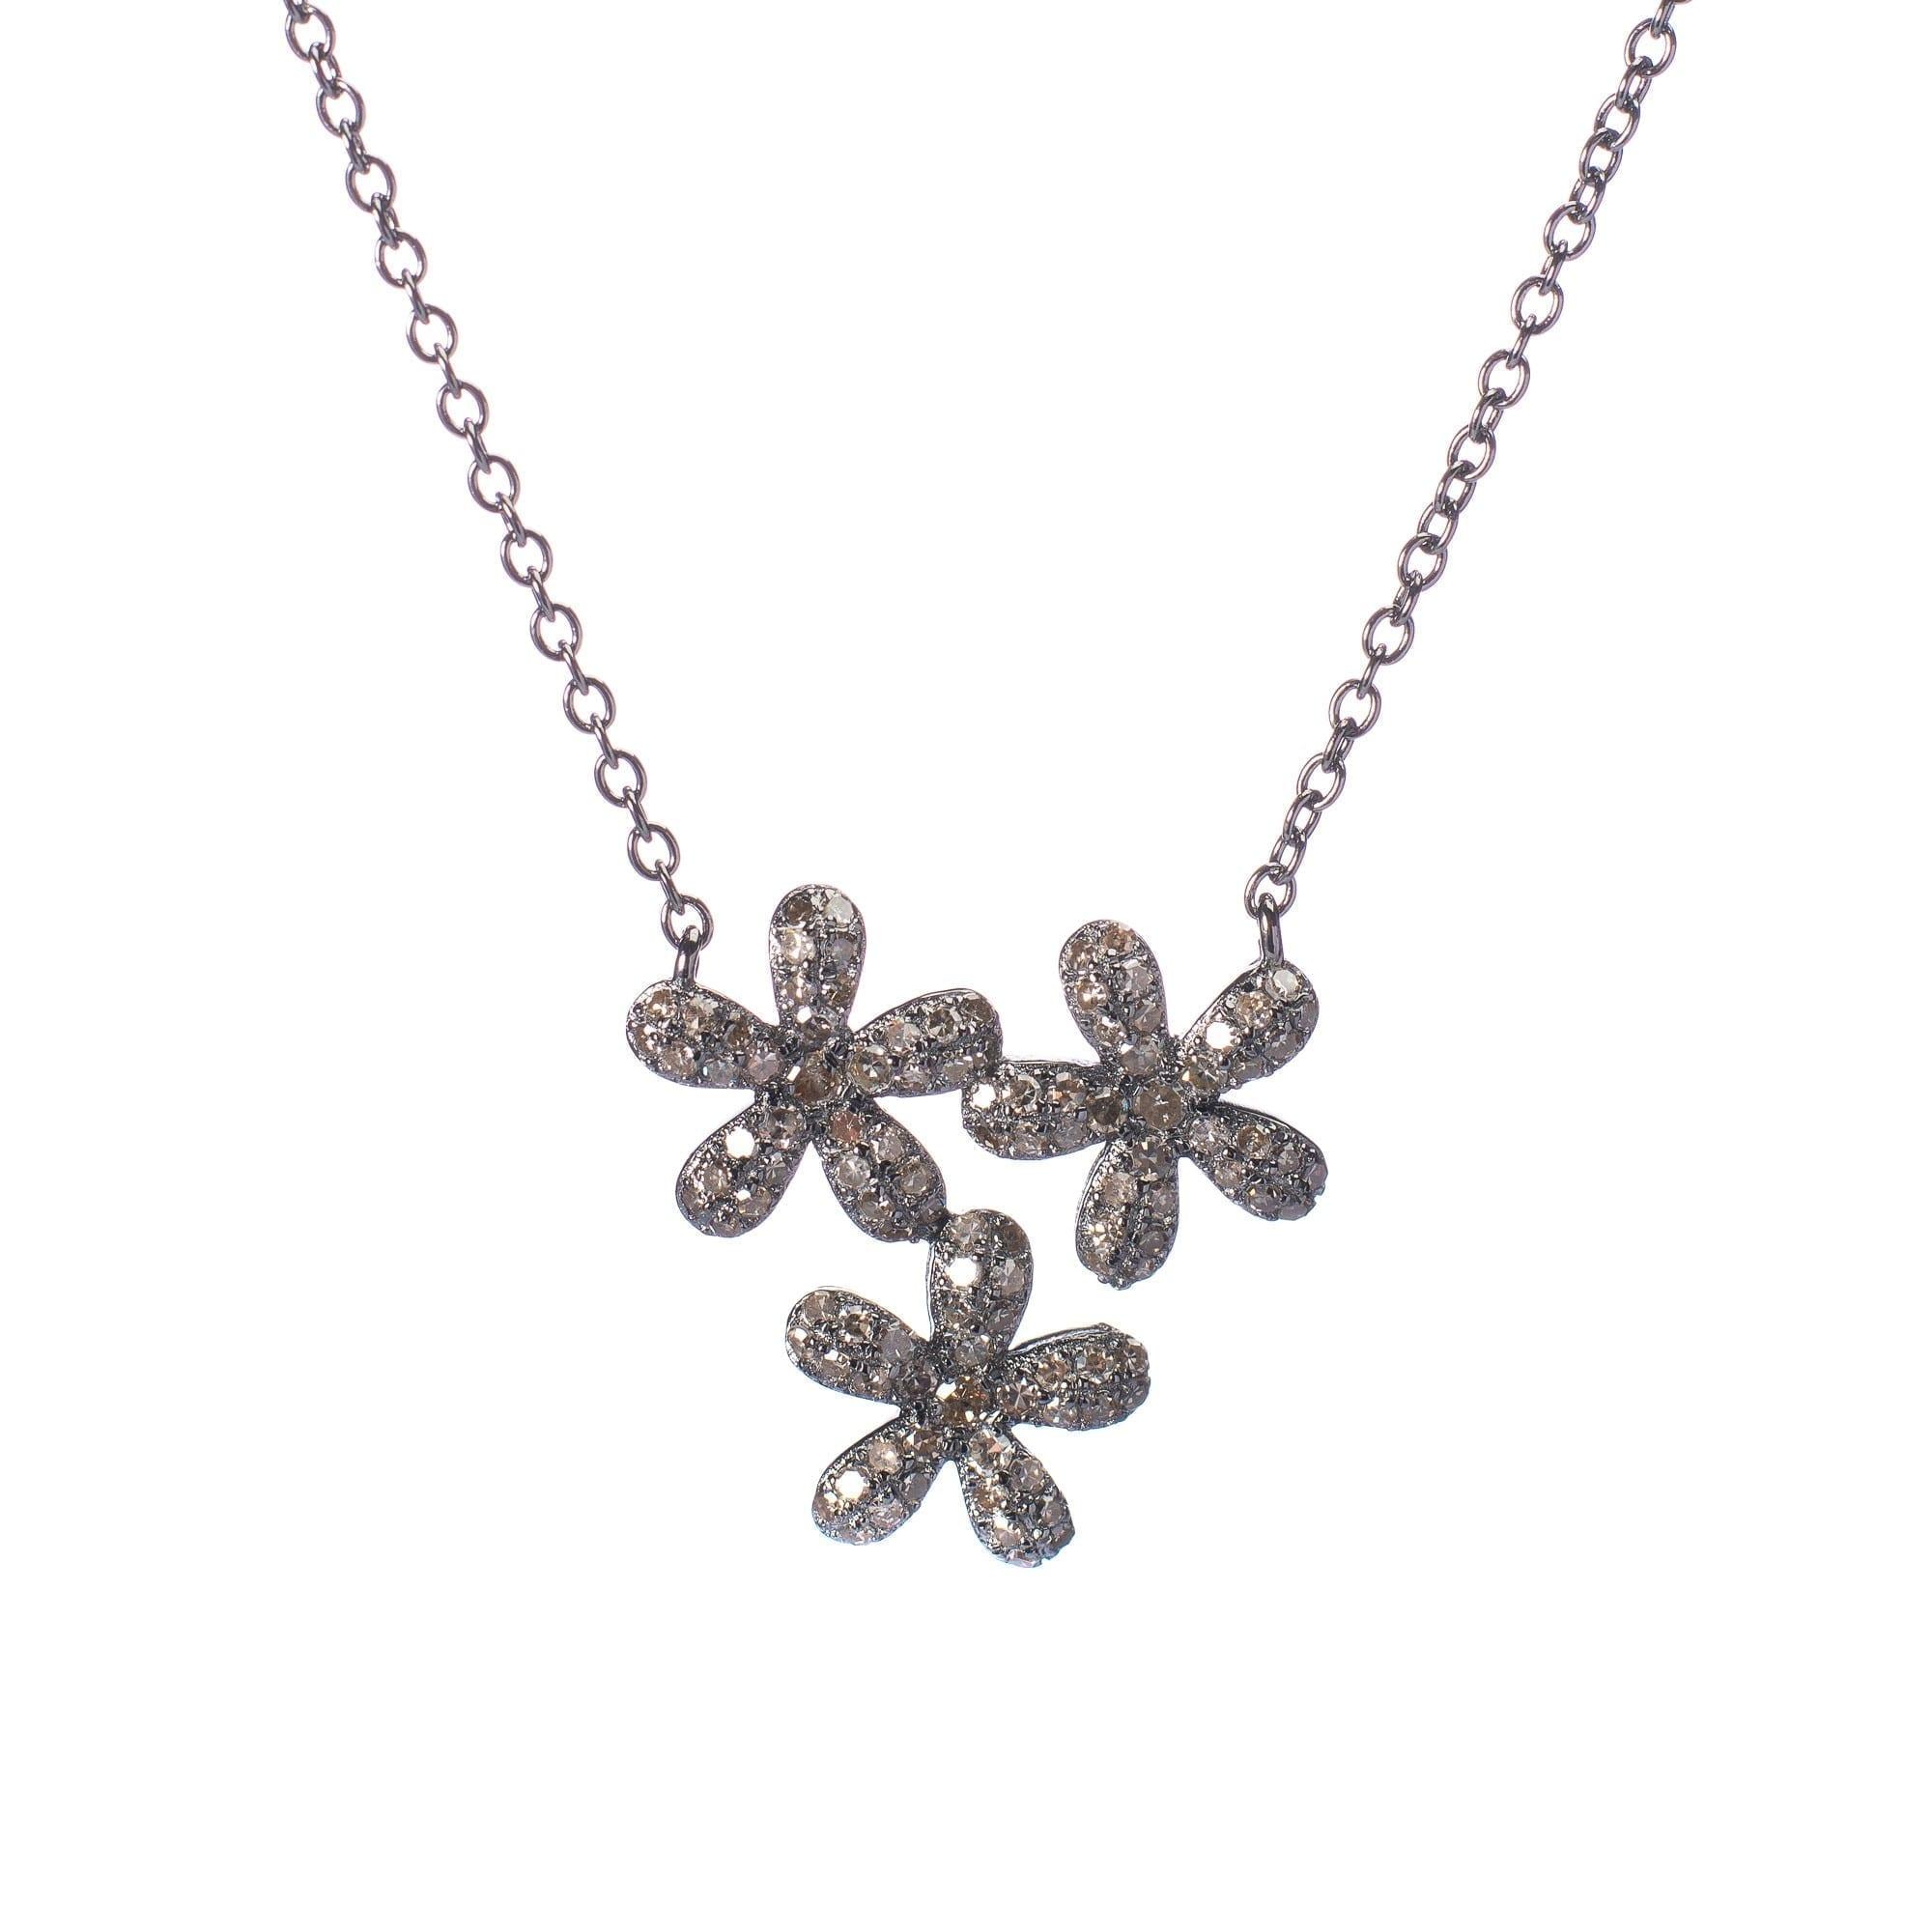 Triple Diamond Daisy Necklace